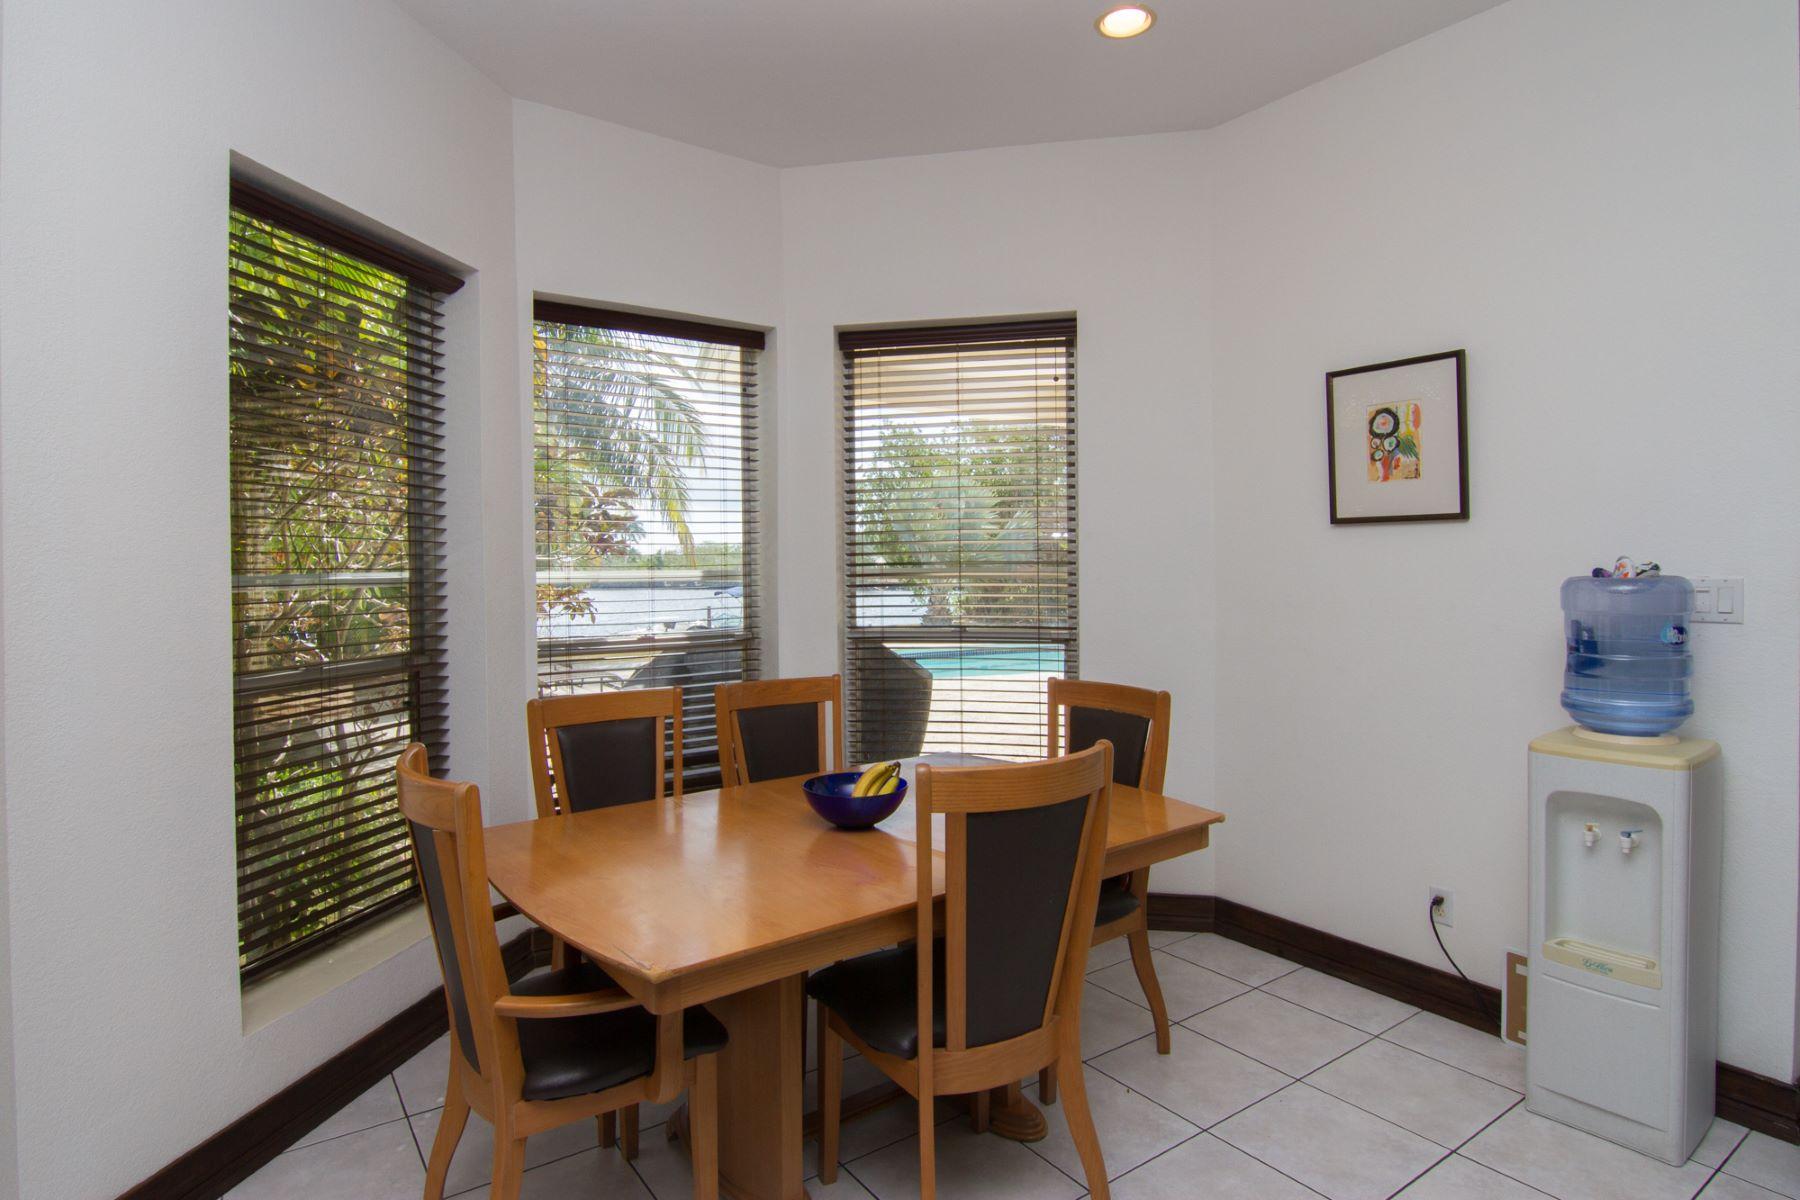 Additional photo for property listing at Patrick's Island Executive Villa 开曼群岛其他地方, 开曼群岛的其他地区 开曼群岛